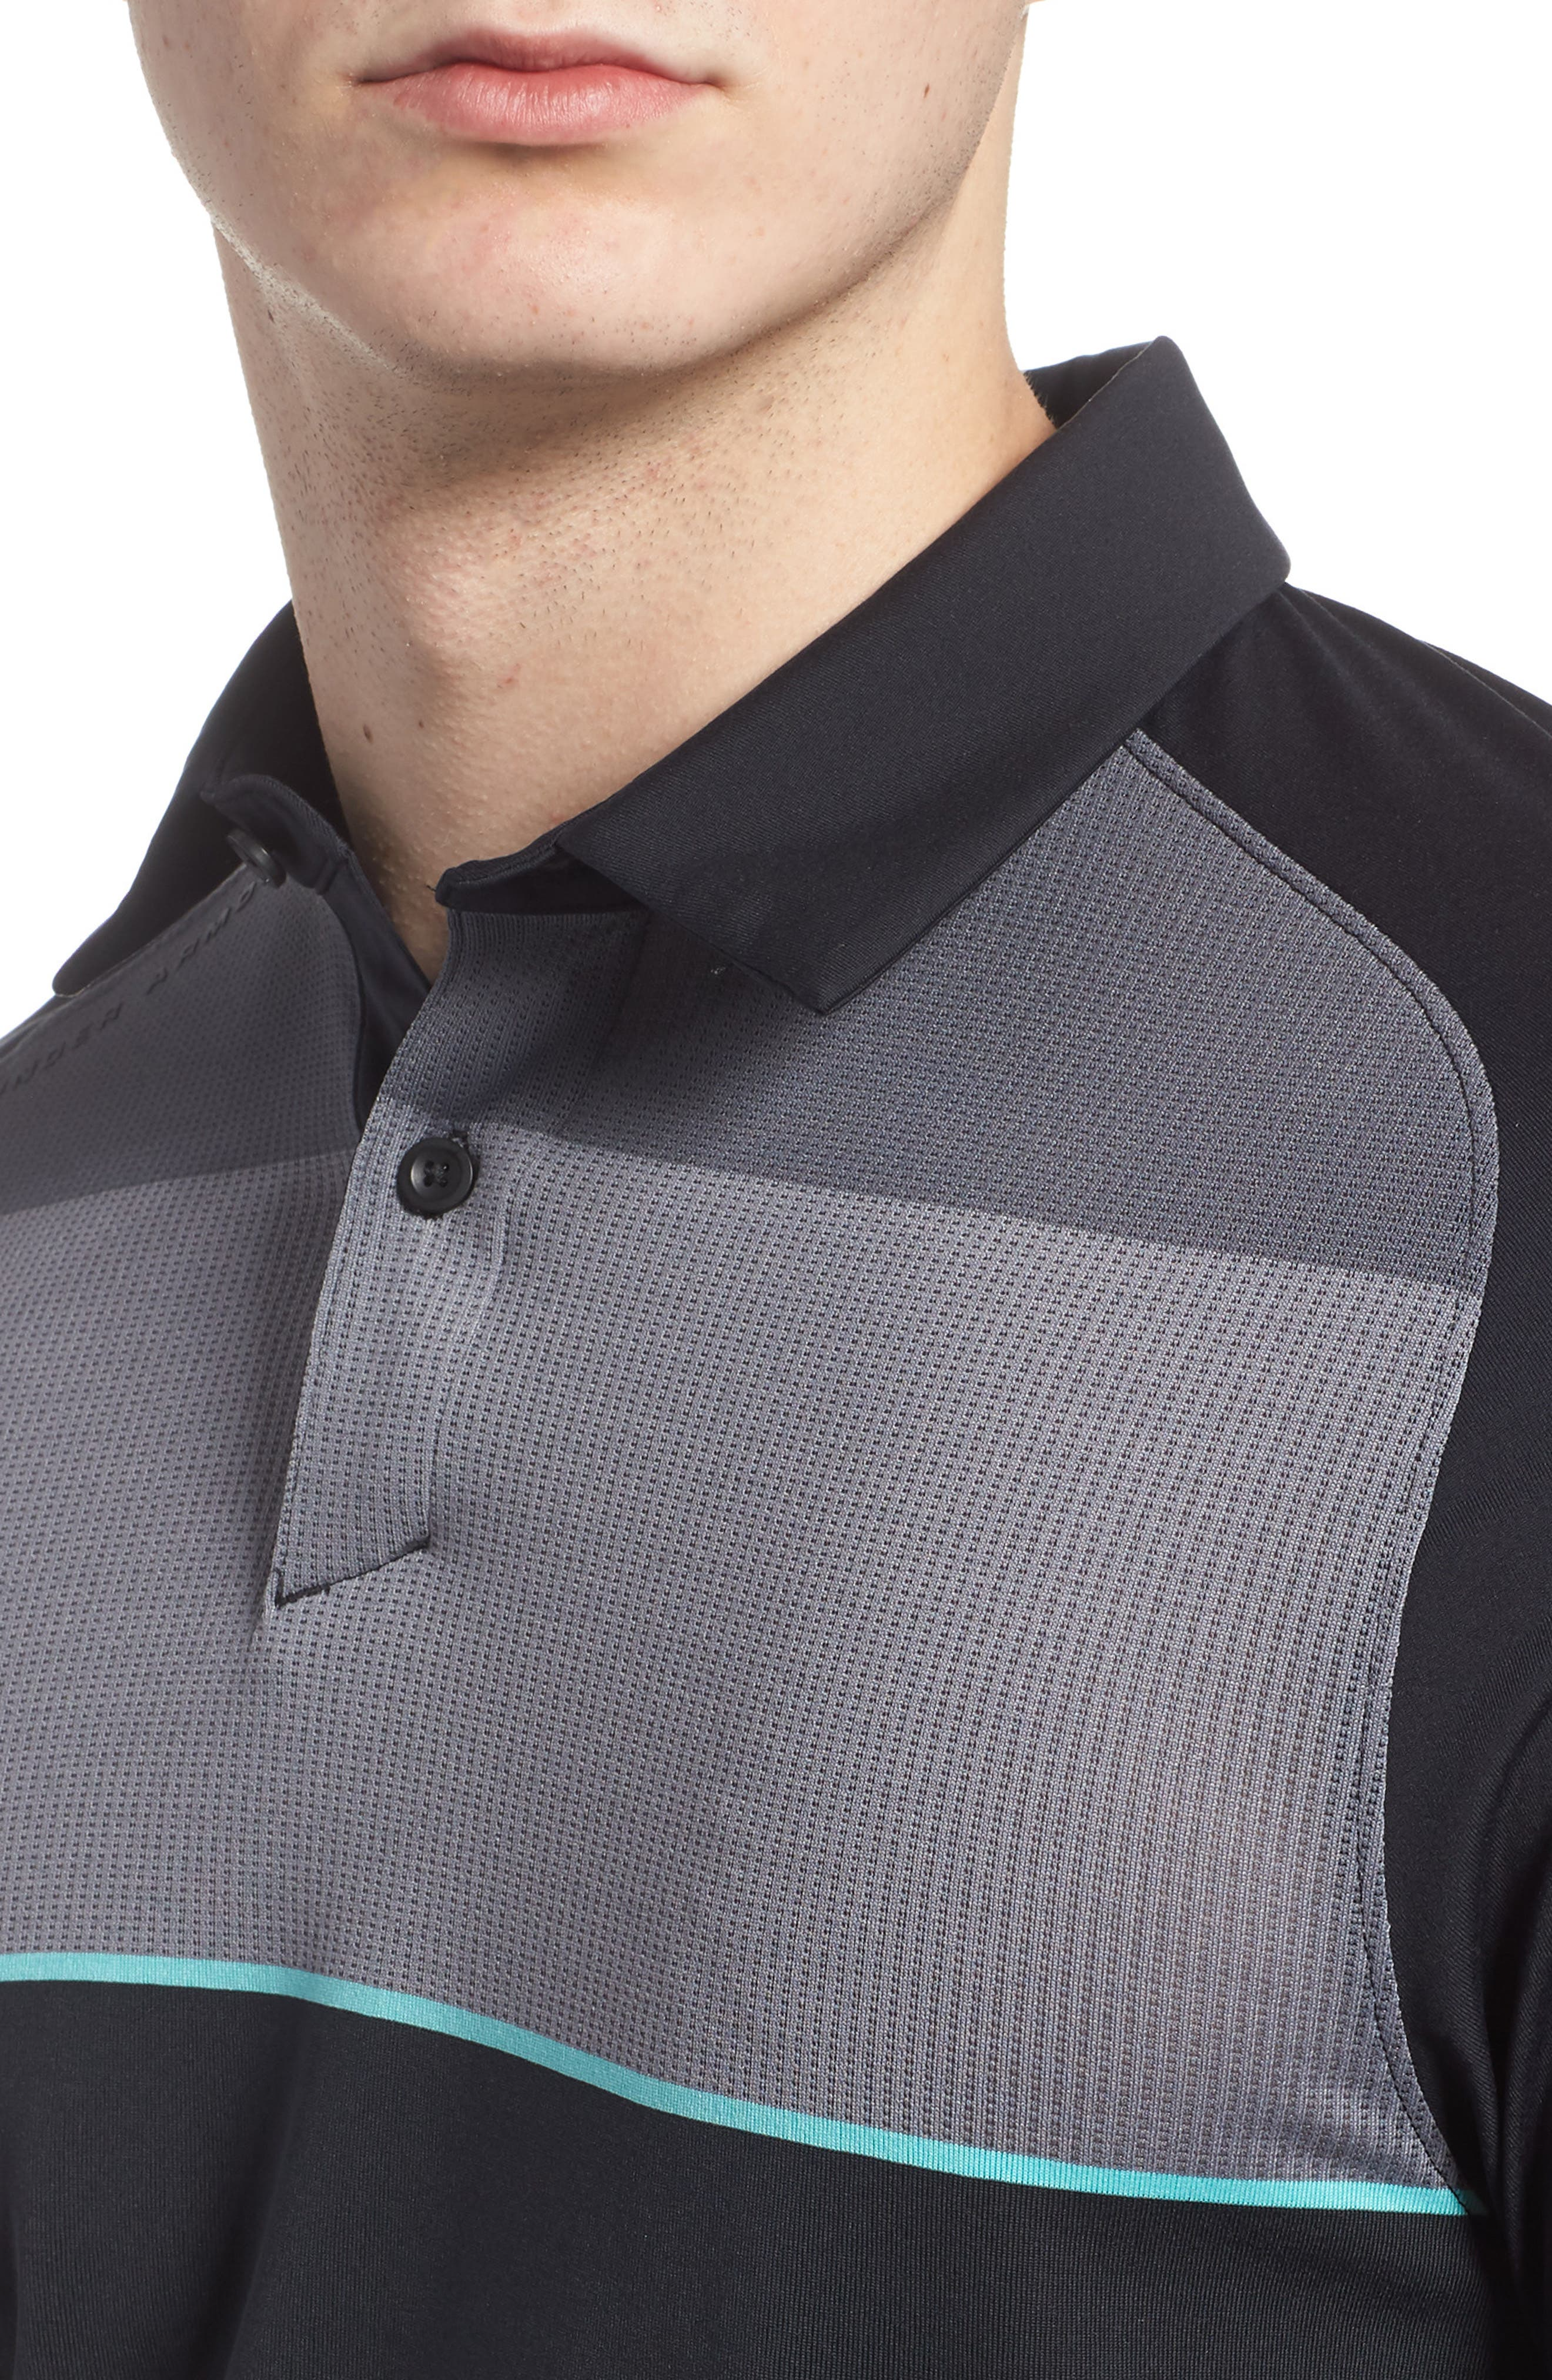 Threadborne Infinite Regular Fit Polo Shirt,                             Alternate thumbnail 4, color,                             001